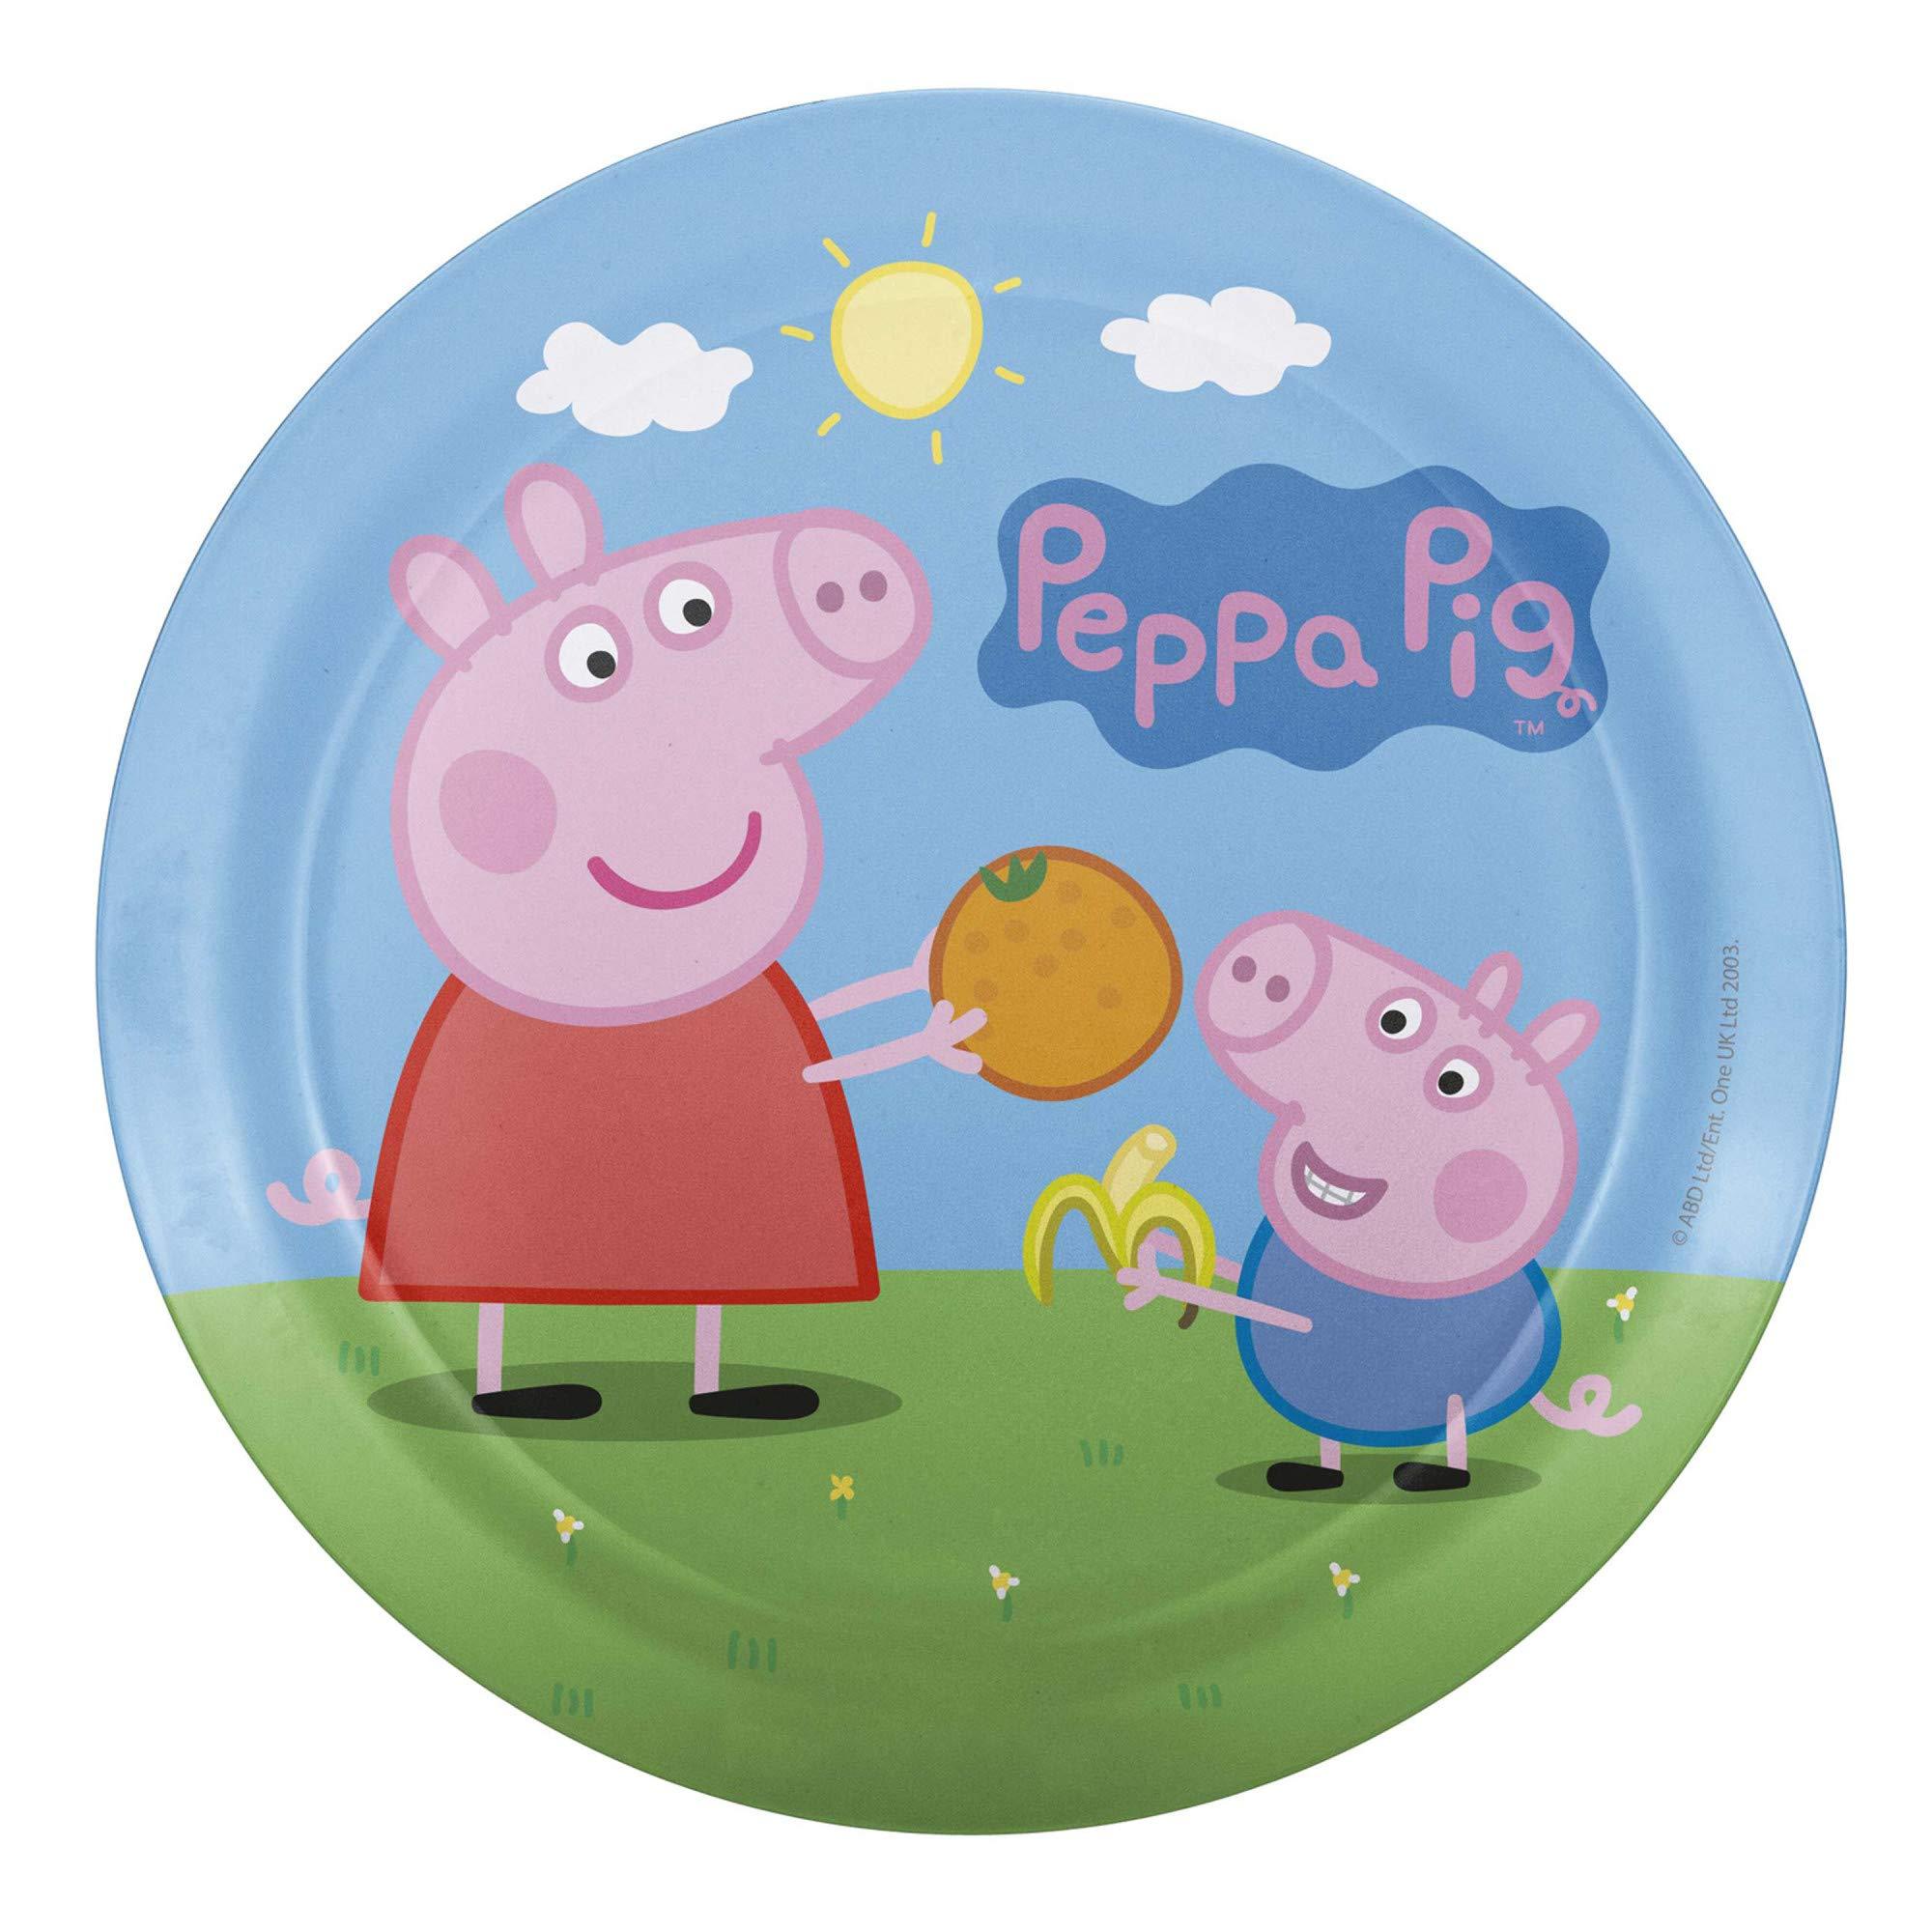 Nick Jr. PEPA-0391 Peppa Pig Melamine Plates 3-piece set by Zak Designs by Zak Designs (Image #3)